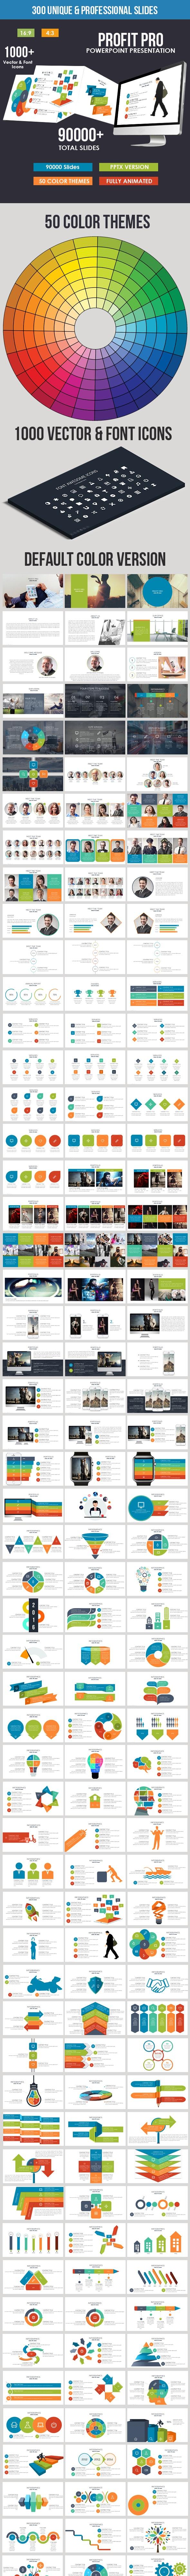 Profit Pro PowerPoint Presentation Template - Business PowerPoint Templates